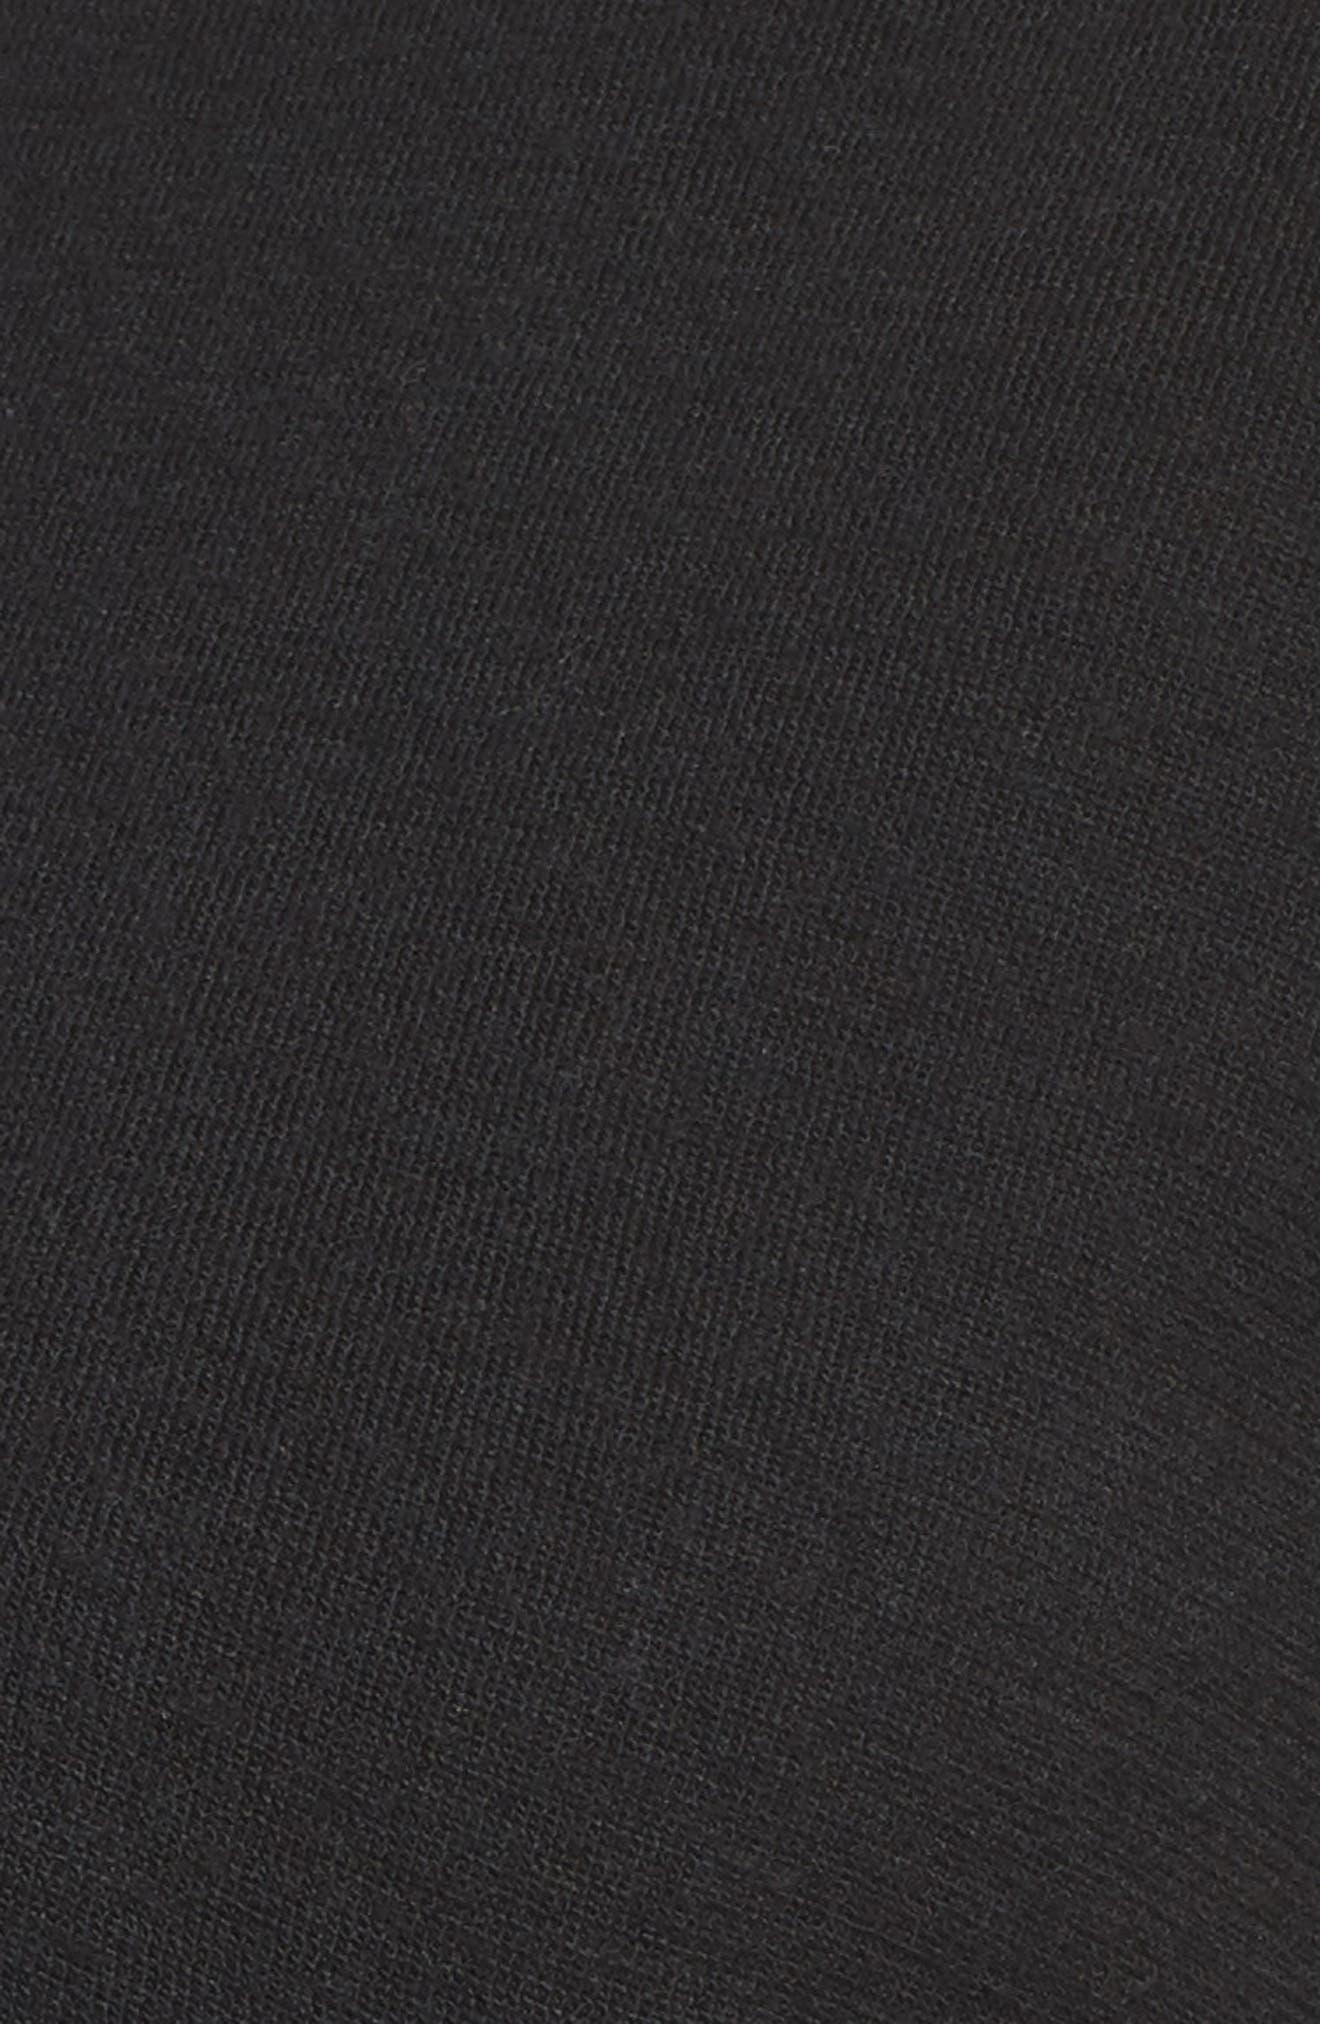 Lizy Track Jacket,                             Alternate thumbnail 5, color,                             BLACK